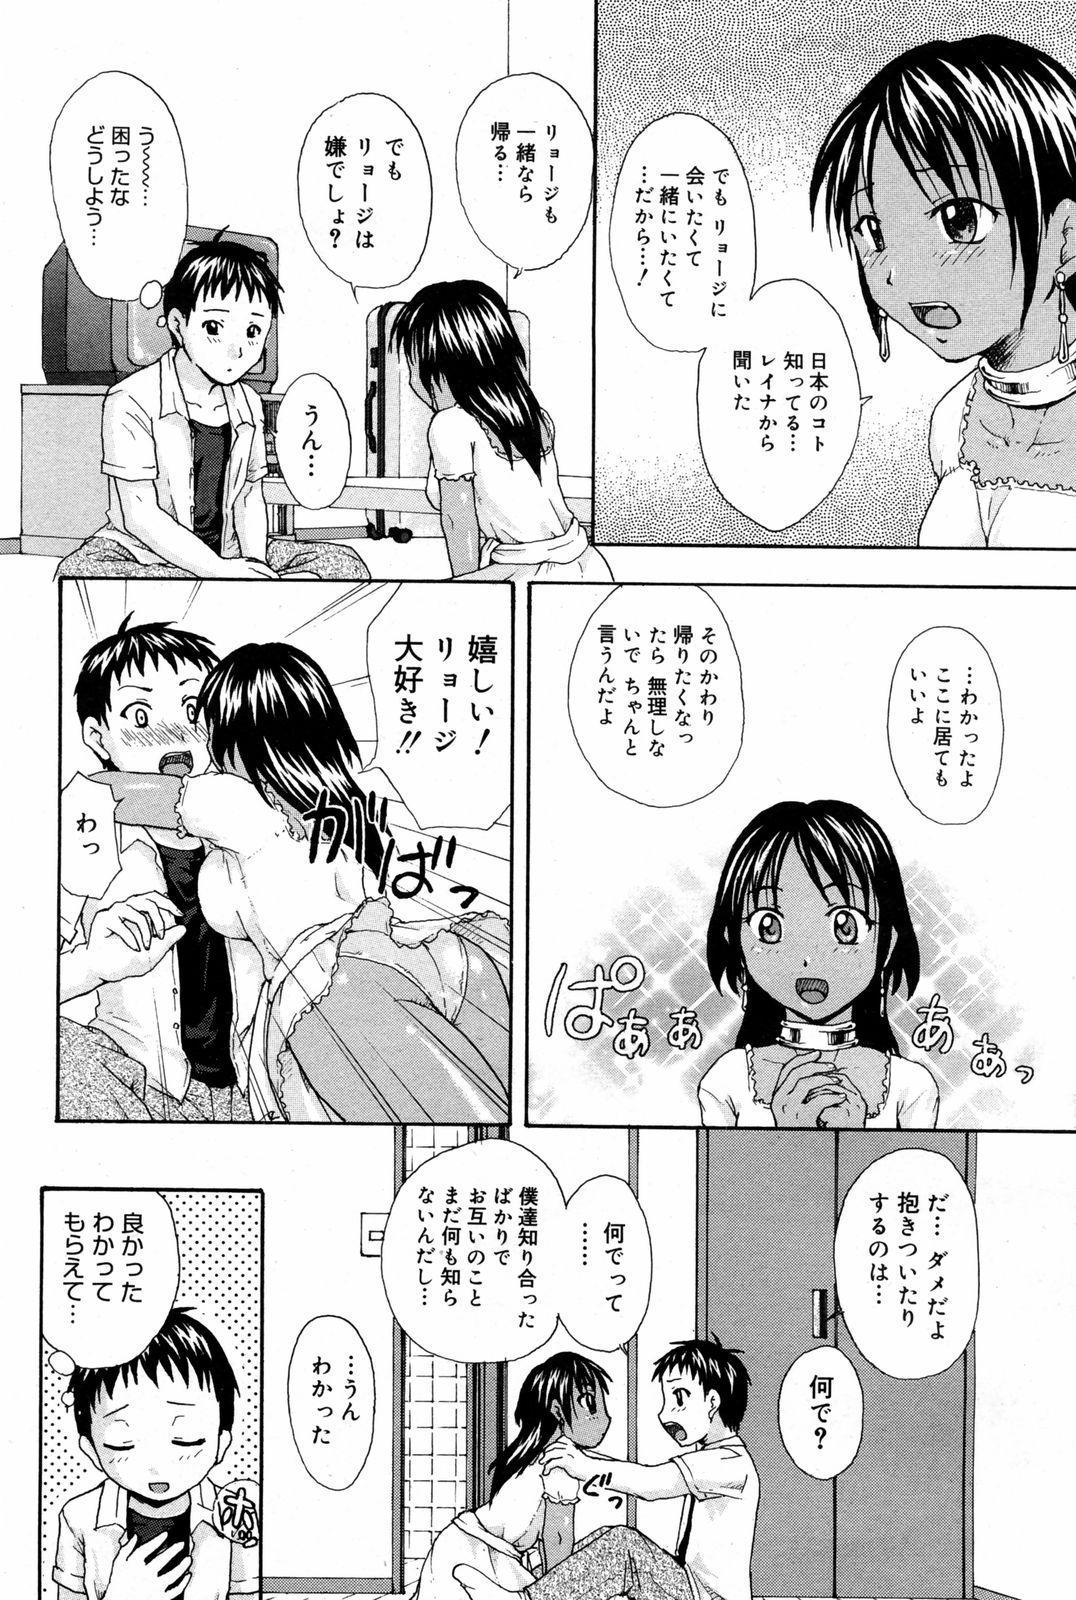 Manga Bangaichi 2008-03 217